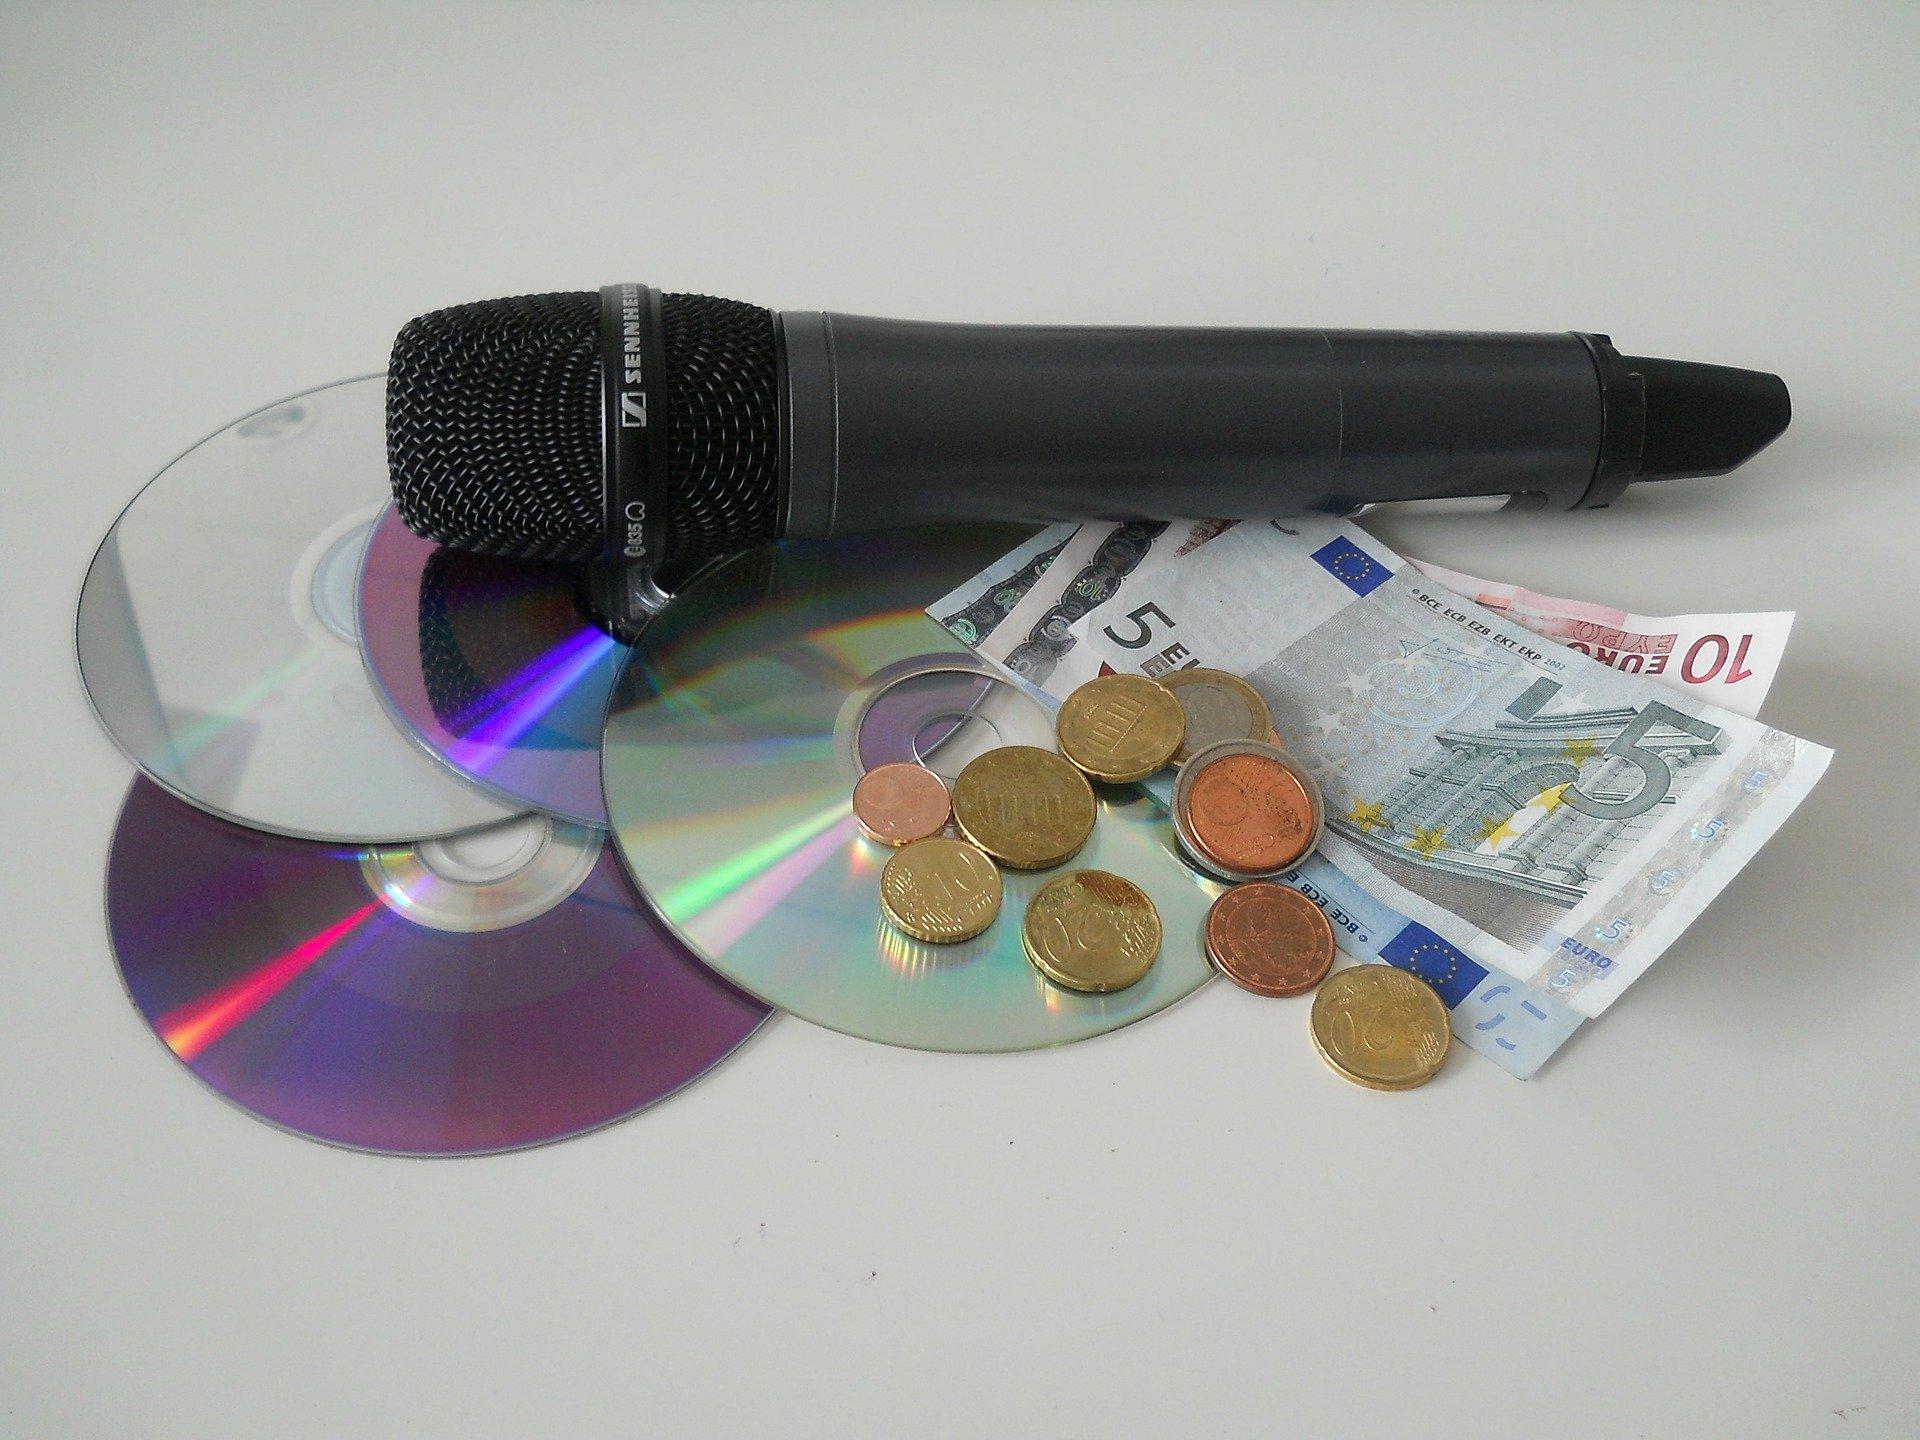 GEMA Abgabe: 5 Euro pro iPhone, 7 Euro pro iPad! 1